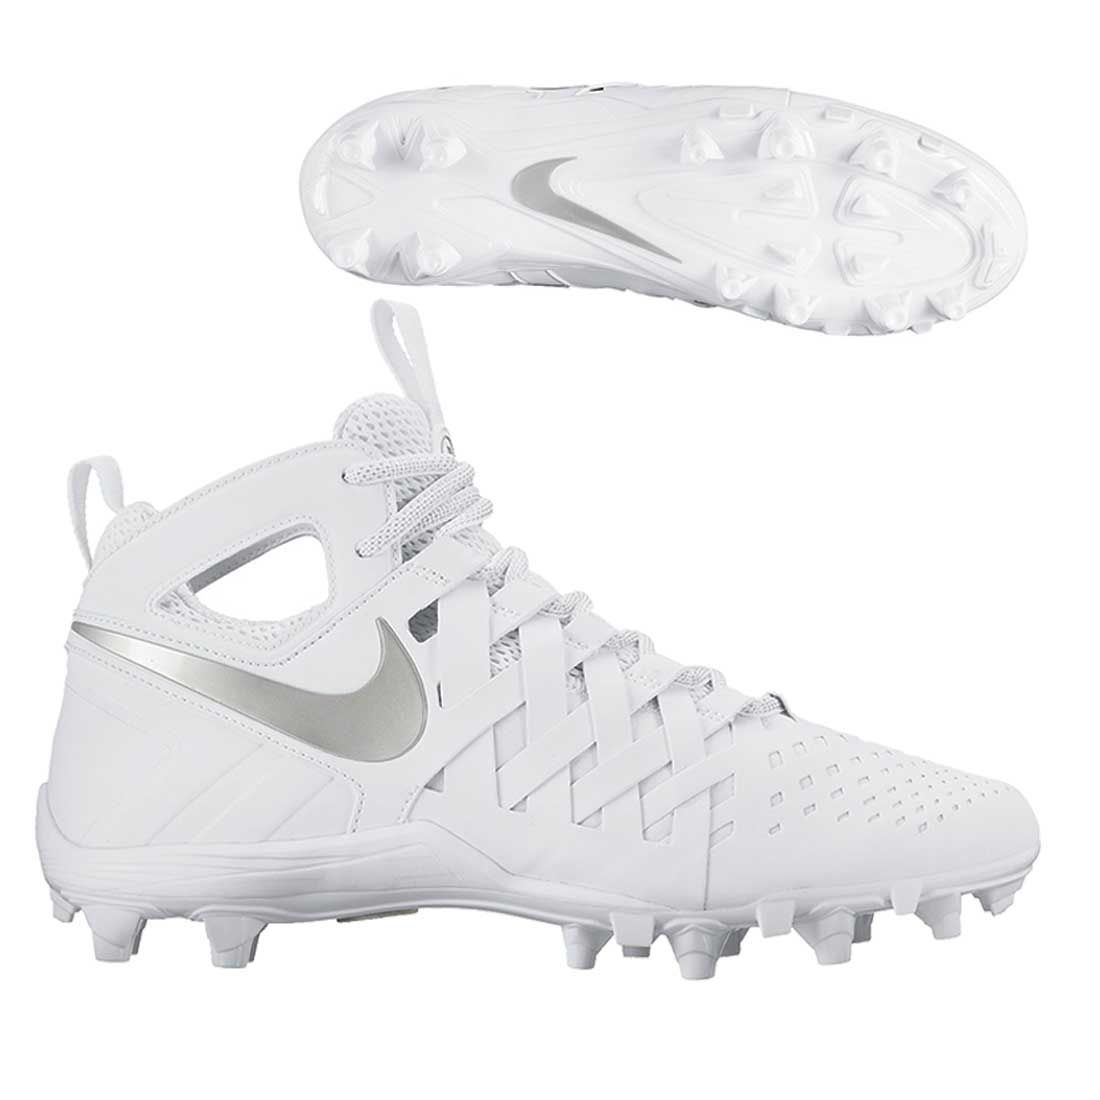 Nike Huarache V Lax Cleat Longstreth Com Softball Cleats Mens Football Cleats Soccer Cleats